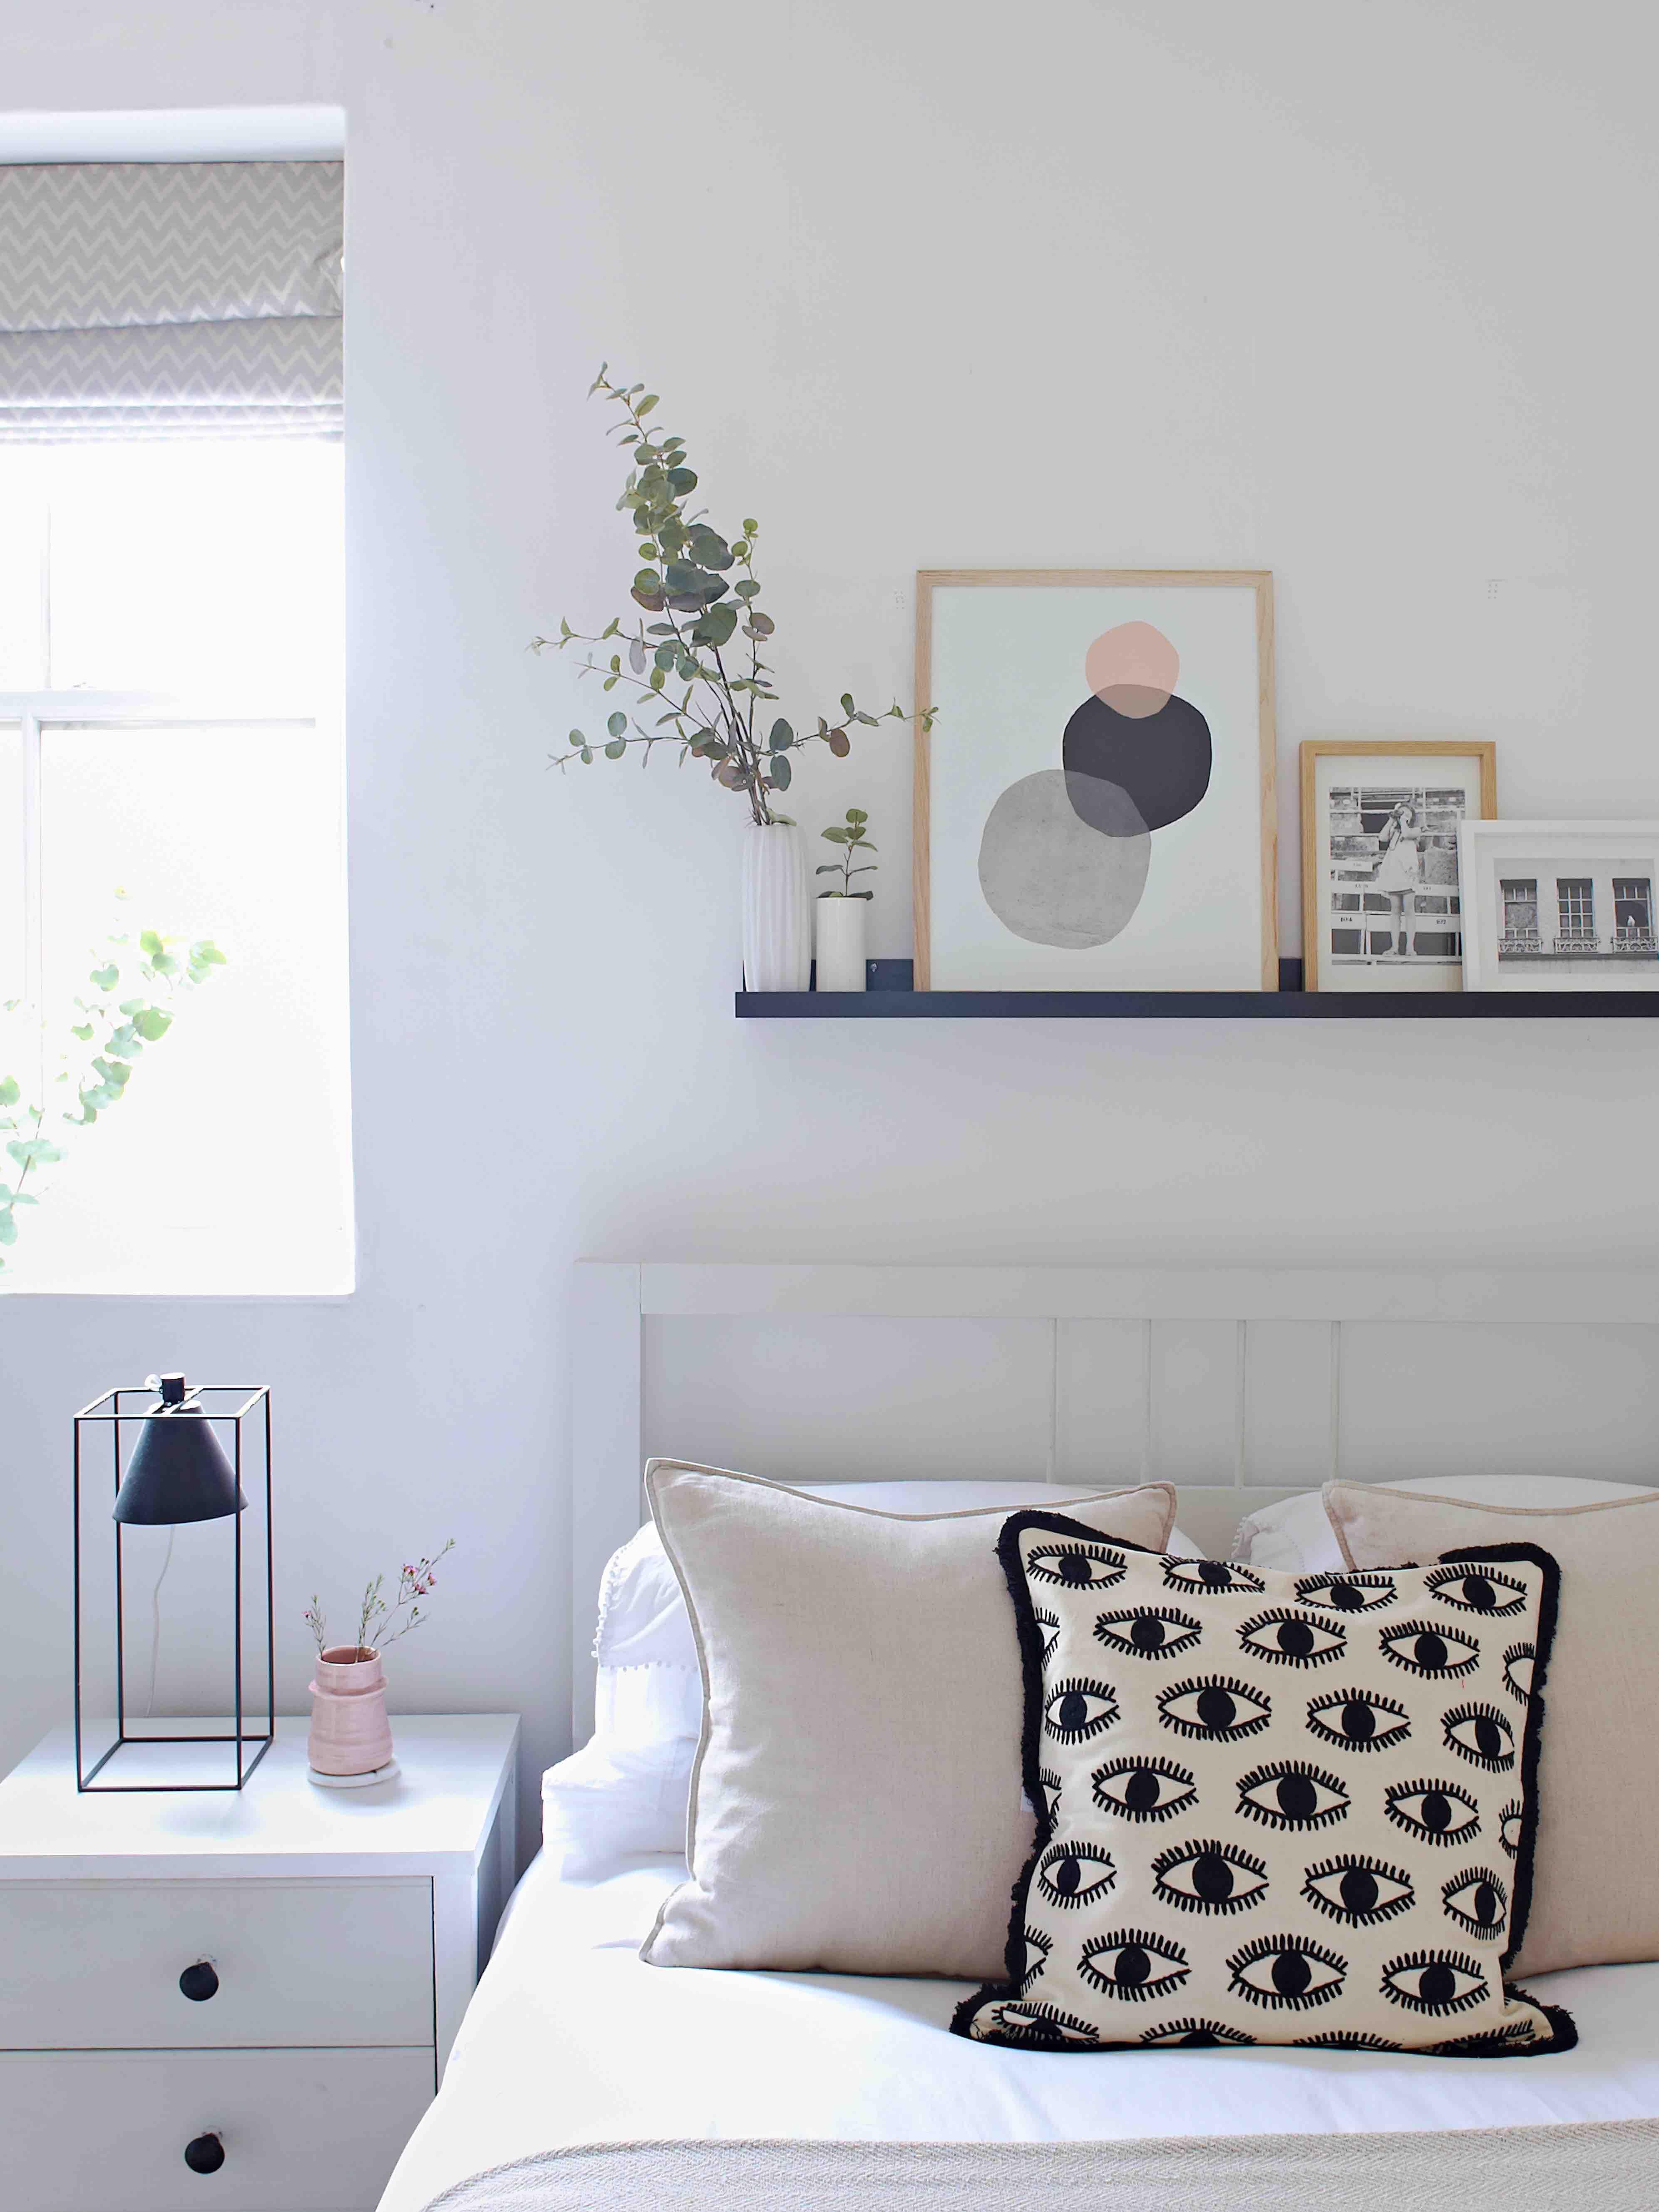 Use An Ikea Mosslanda Picture Rail To Display Art Print Of